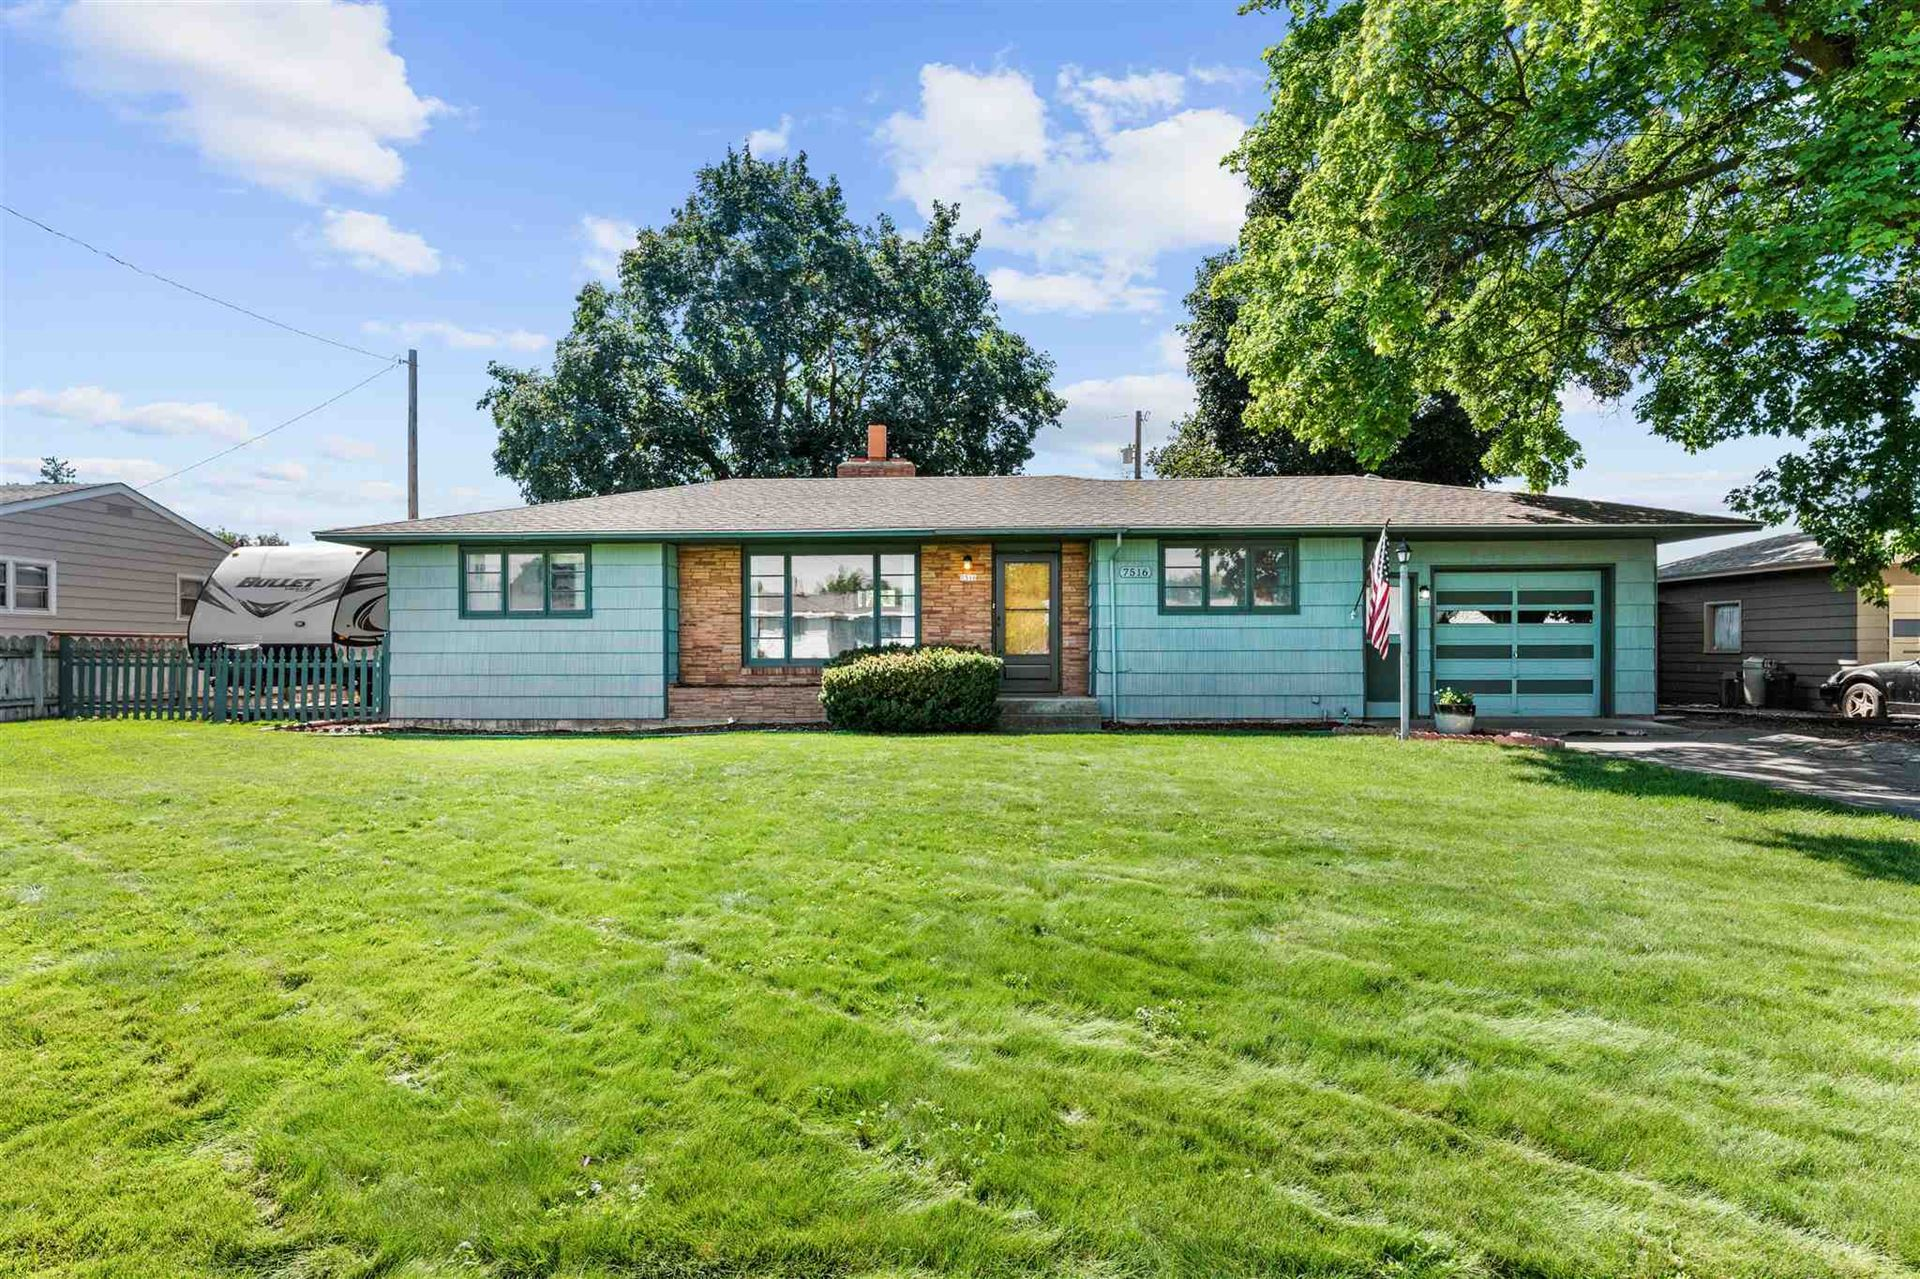 7516 E Nora Ave, Spokane Valley, WA 99212-2516 - #: 202120934